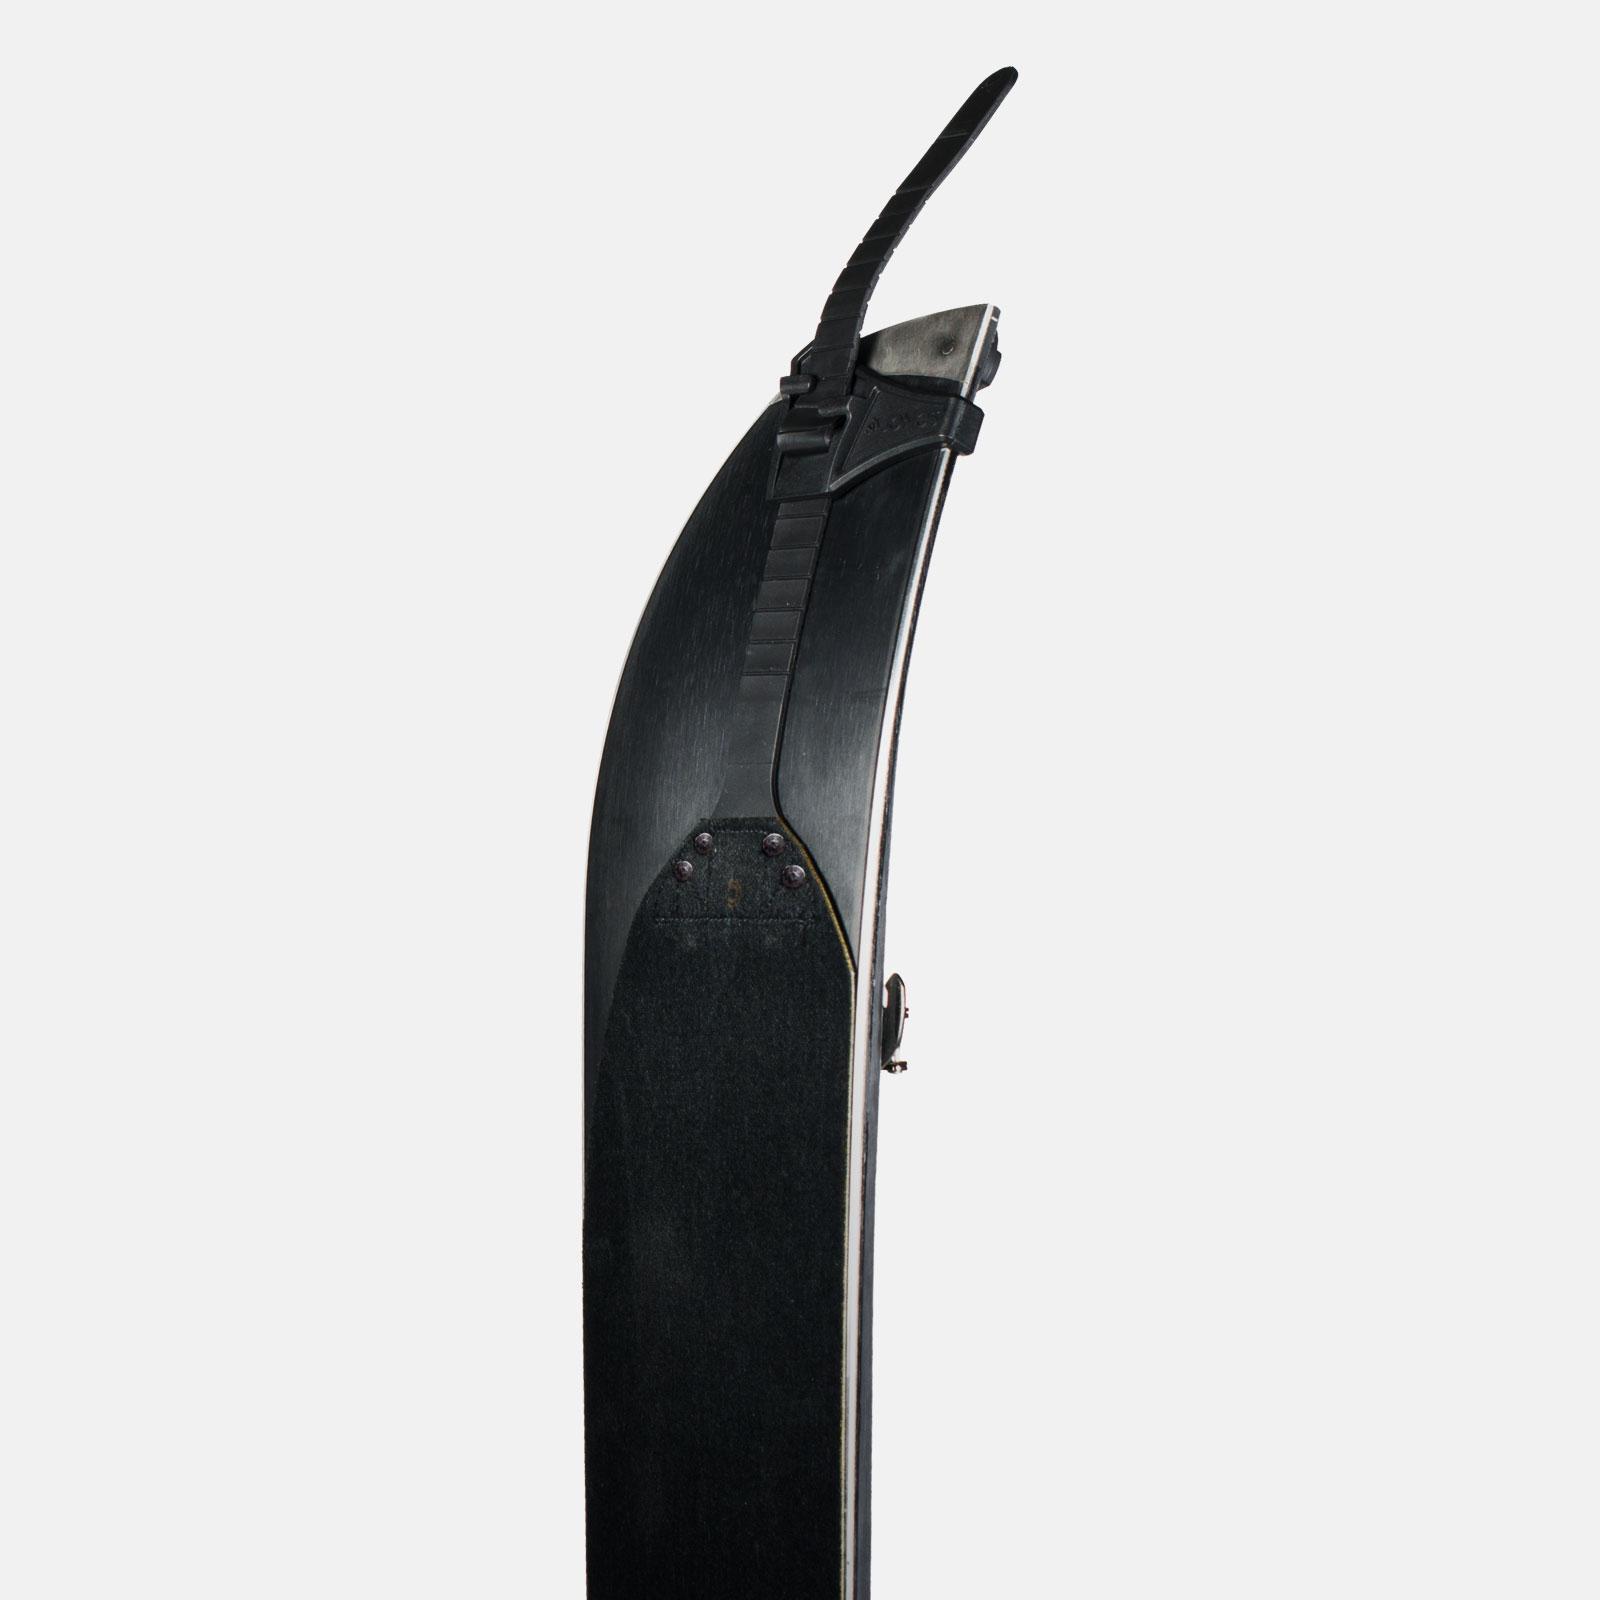 Universal-tail-clip-photo.jpg